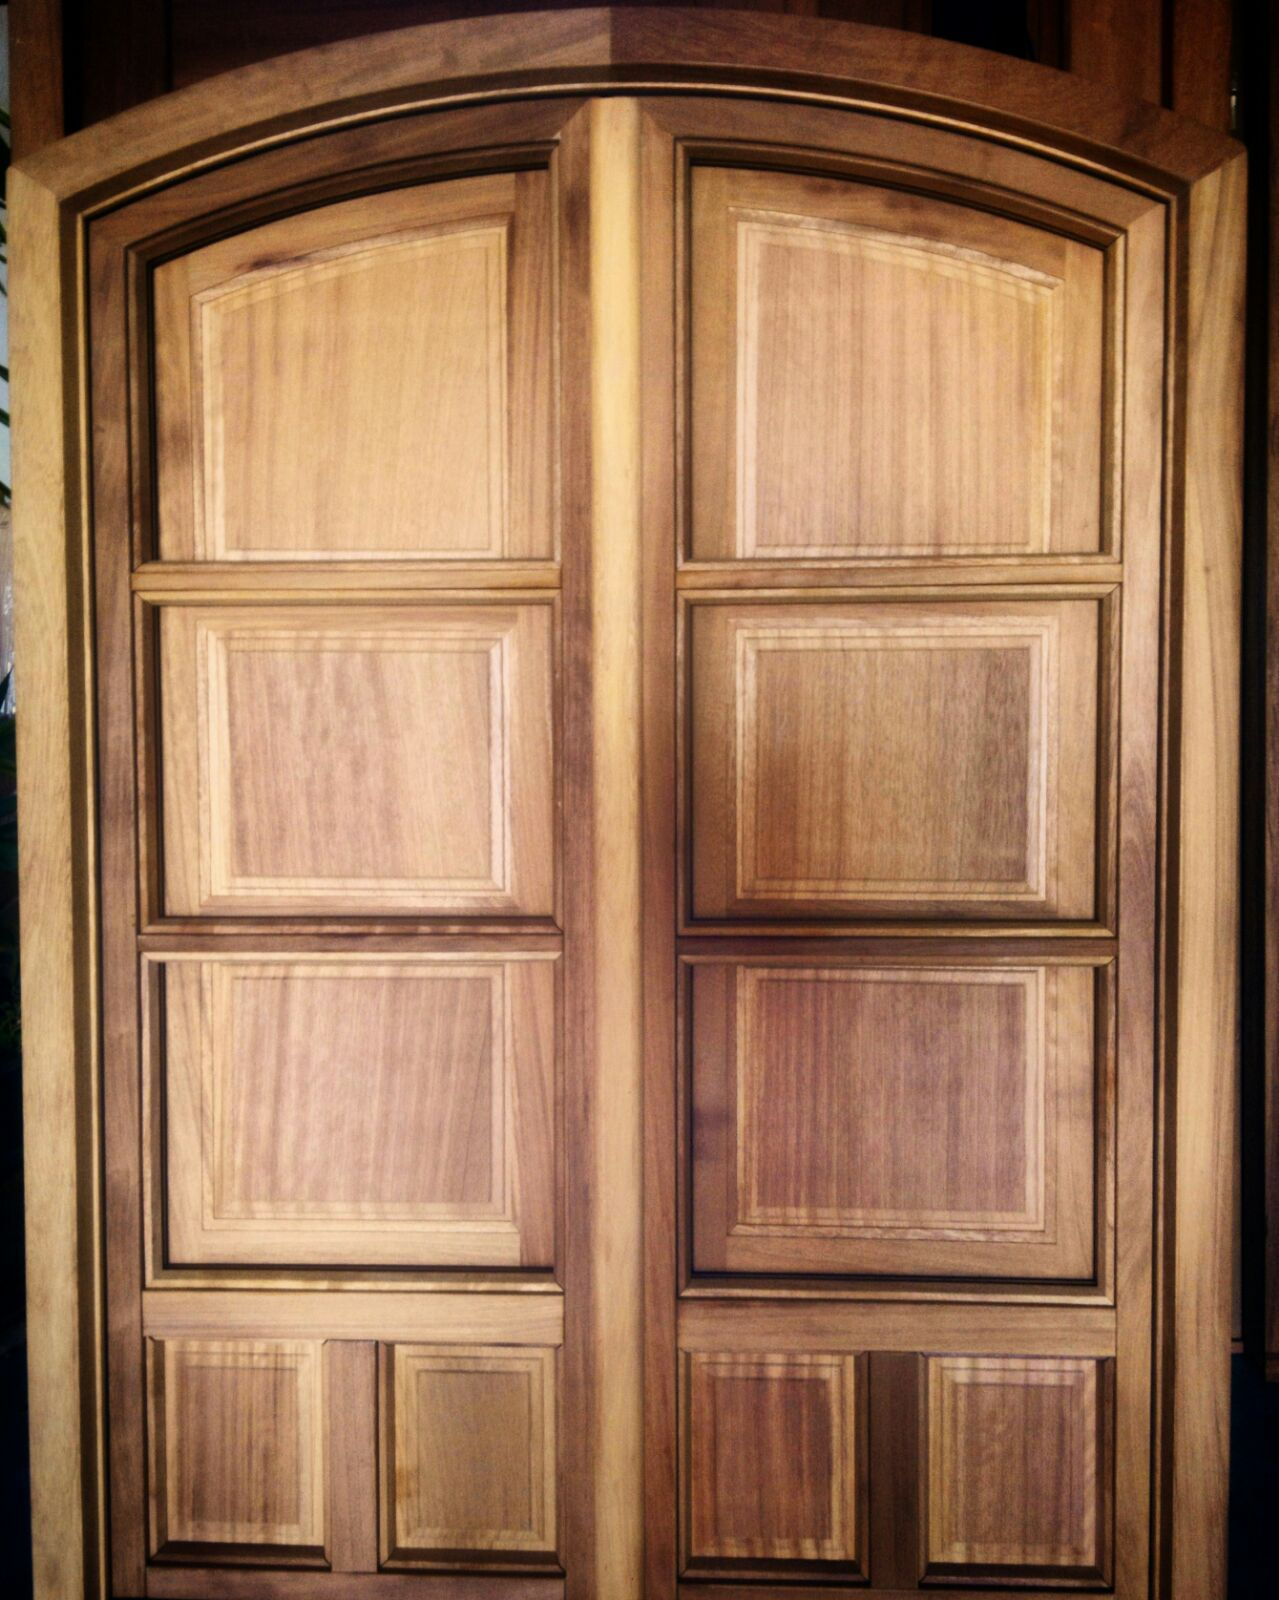 Ventana en arco, con ventanillos interiores , fabricada en madera de ...